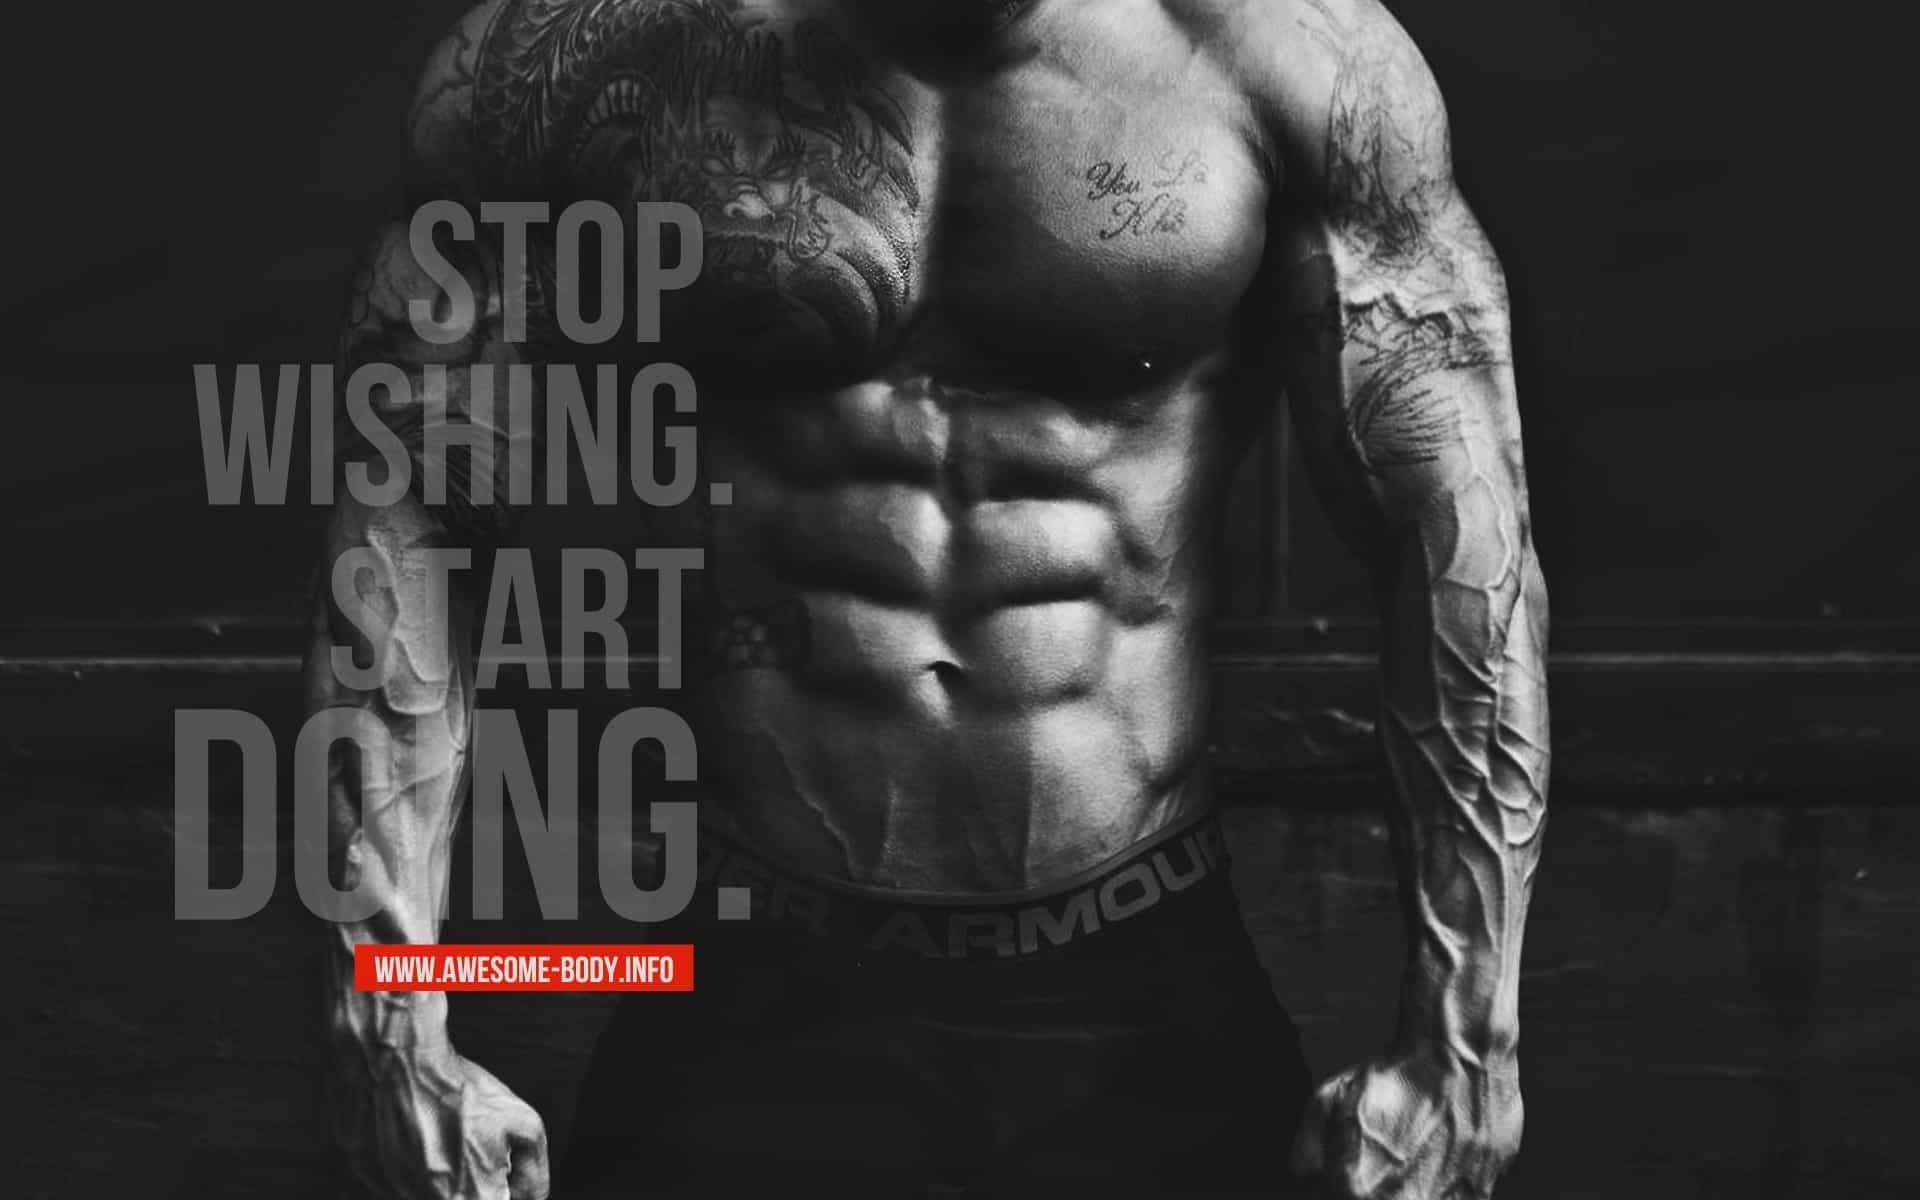 Aesthetic Bodybuilder Hd Wallpapers Wallpaper Cave